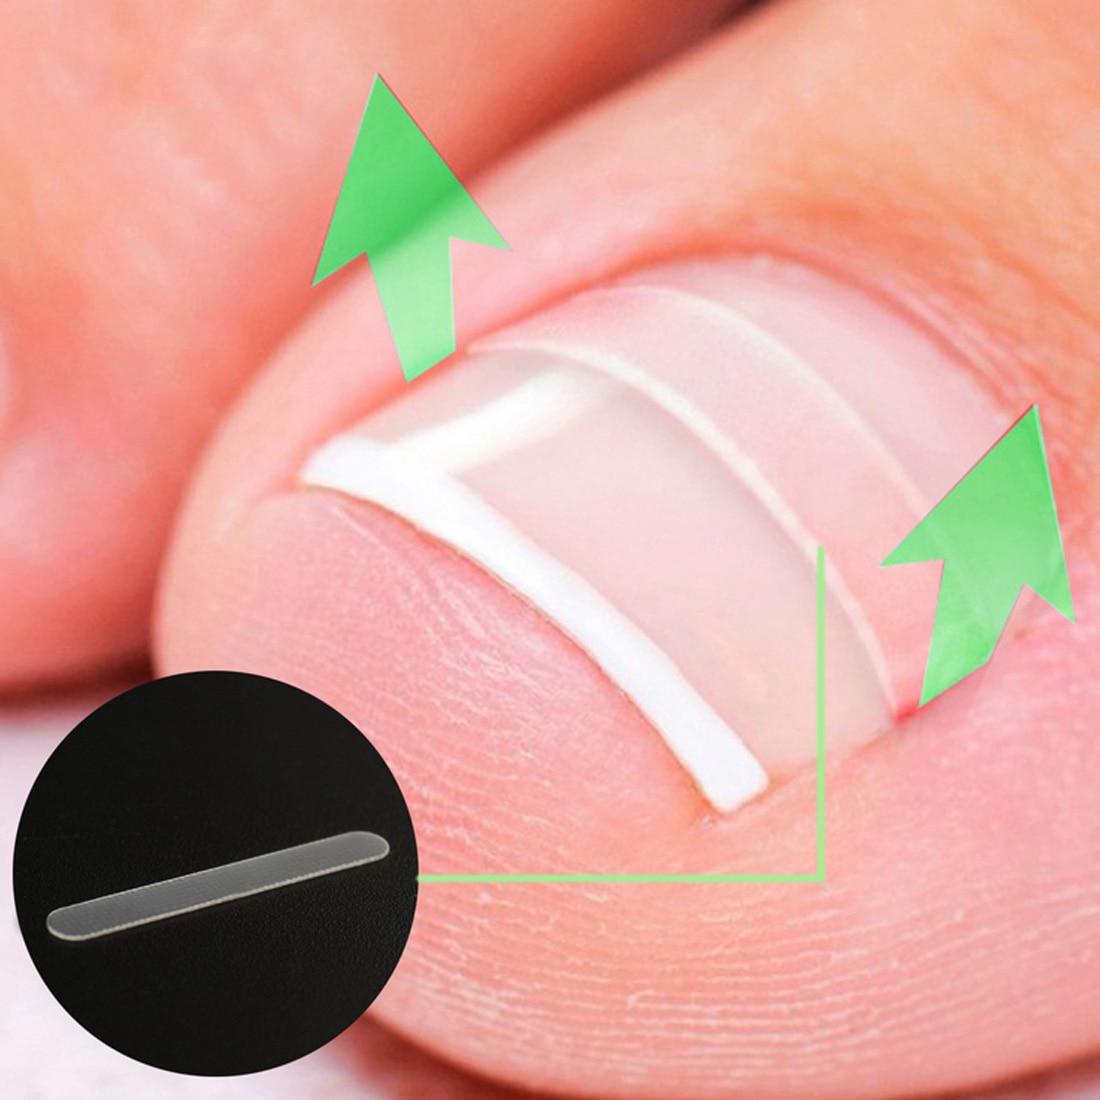 Paronychia Correction File Elastic Patch Corrector Treatment Tools 10pcs/box Toe Nail Ingrown Correction Sticker Patch Foot Care